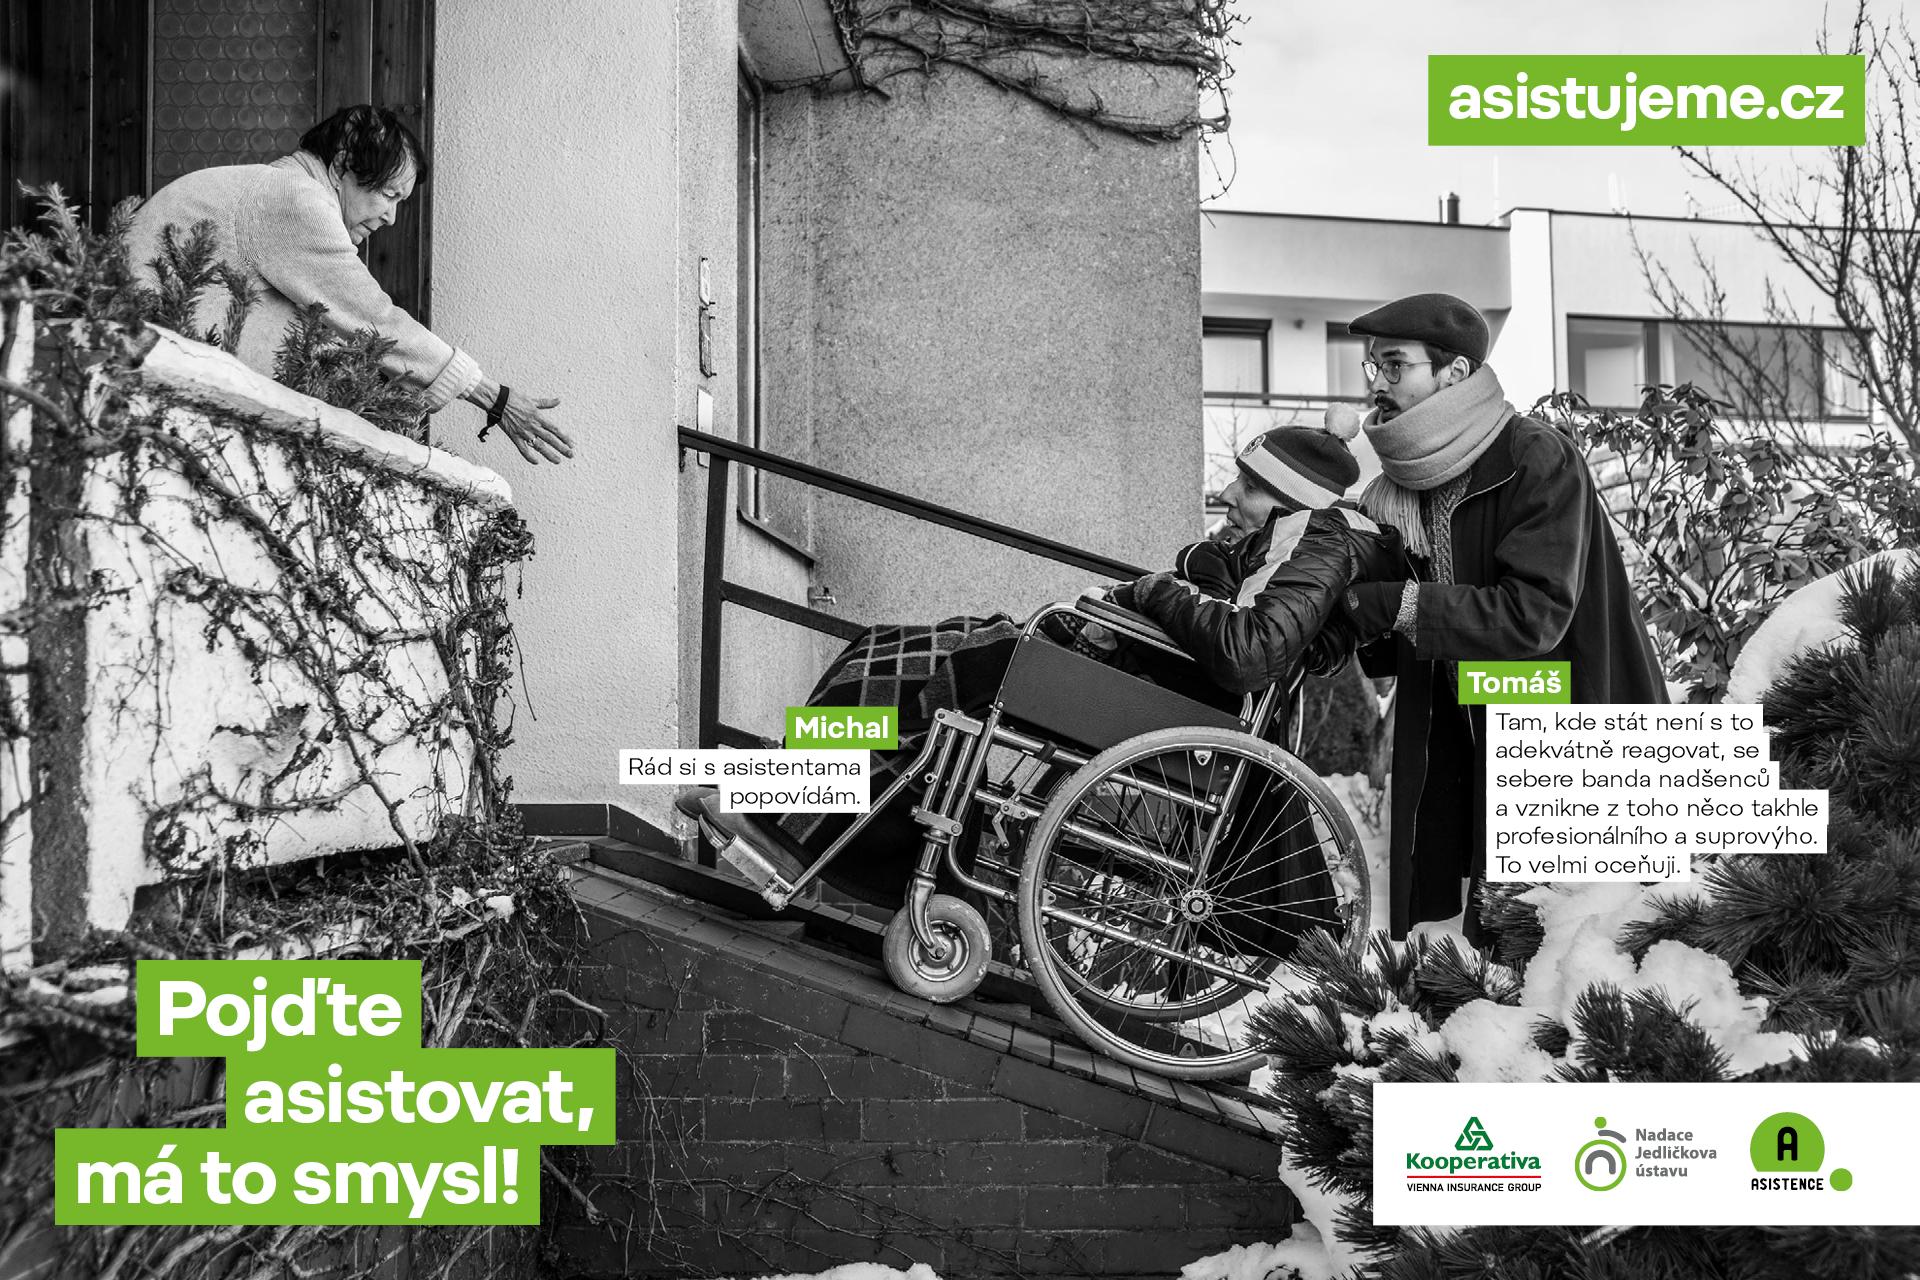 Kampaň Asistujeme.cz